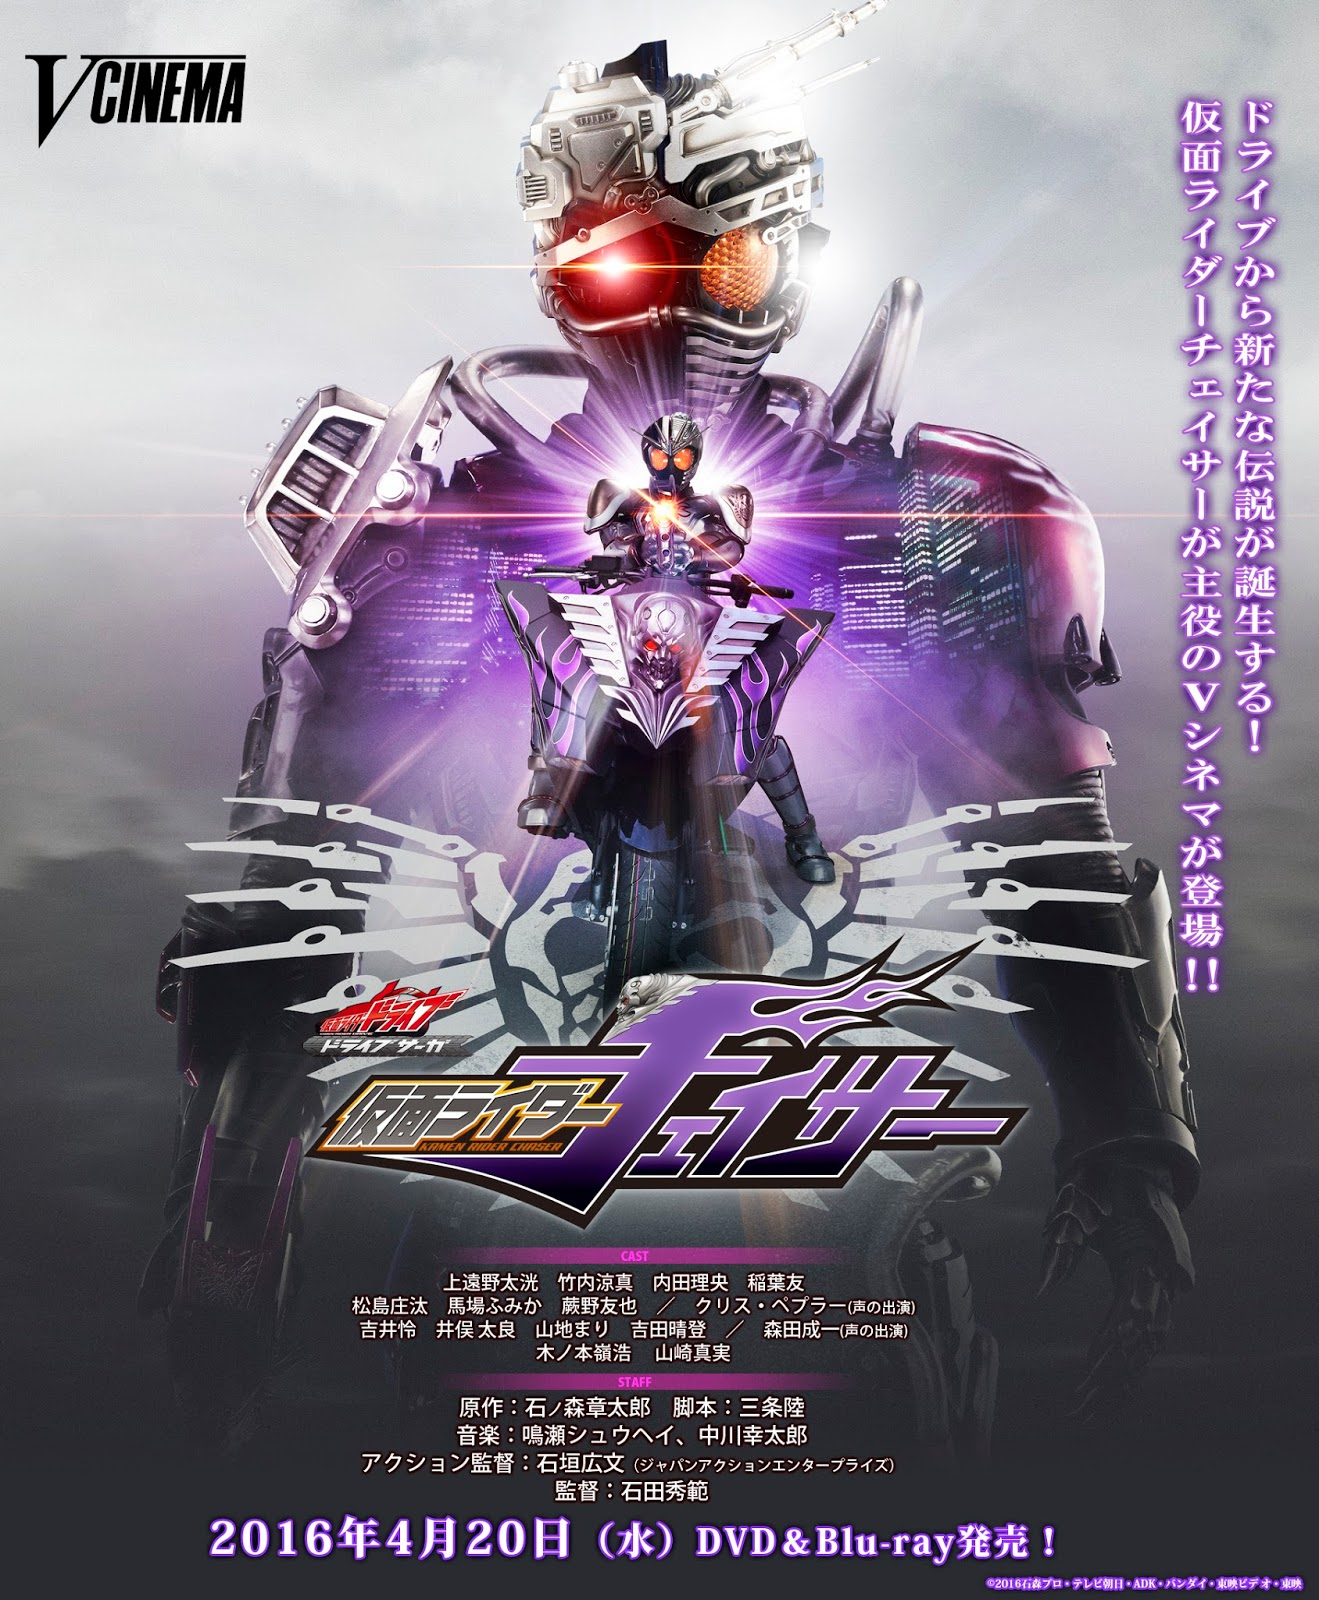 Kamen Rider Drive Saga: Kamen Rider Chaser - Siêu nhân Movie Kamen Rider Chaser VietSub